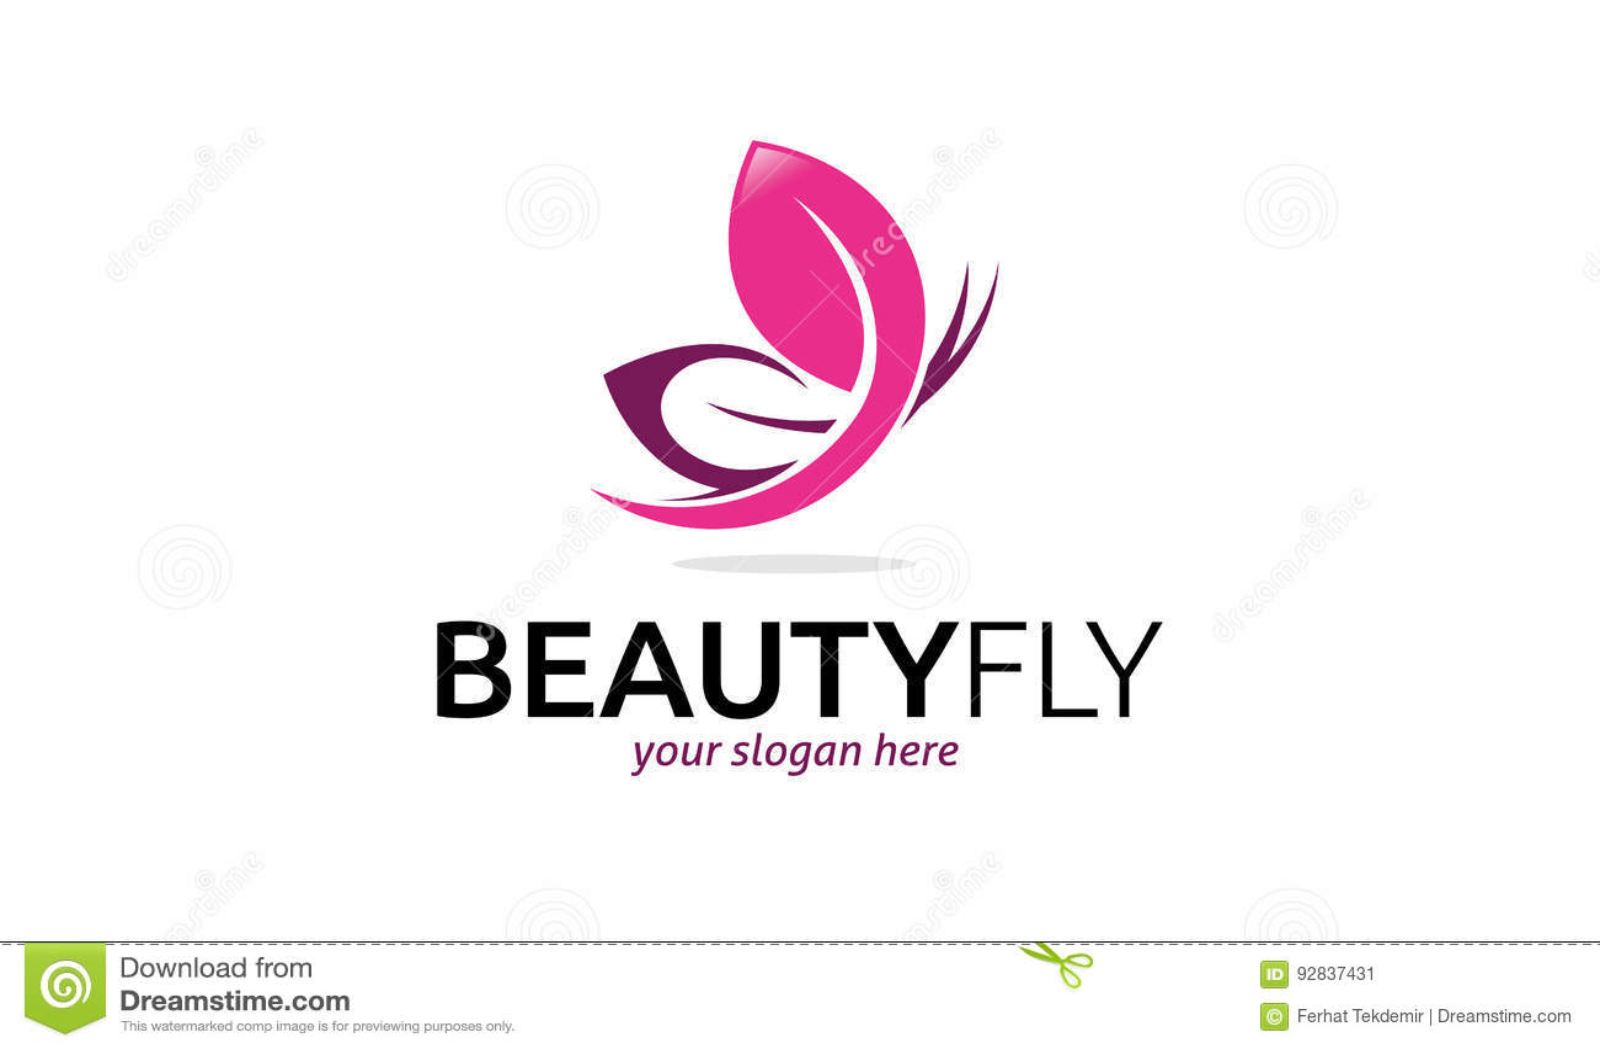 Beauty Fly Logo Stock Vector Illustration Of Luxury 92837431